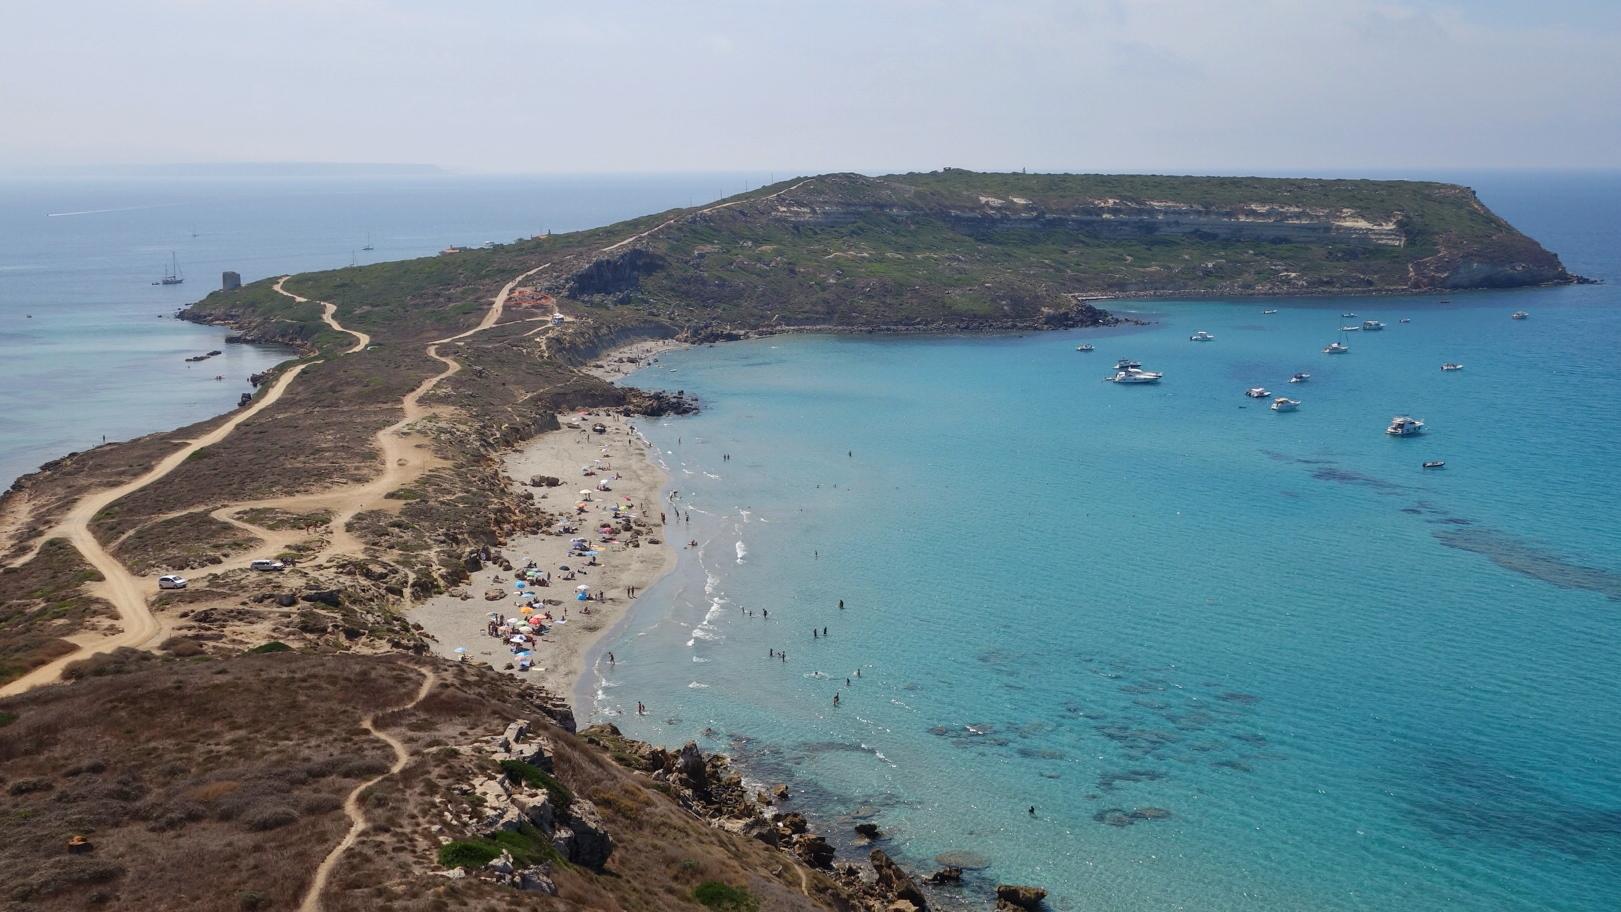 Spiaggia Sant giovanni Sinis 1